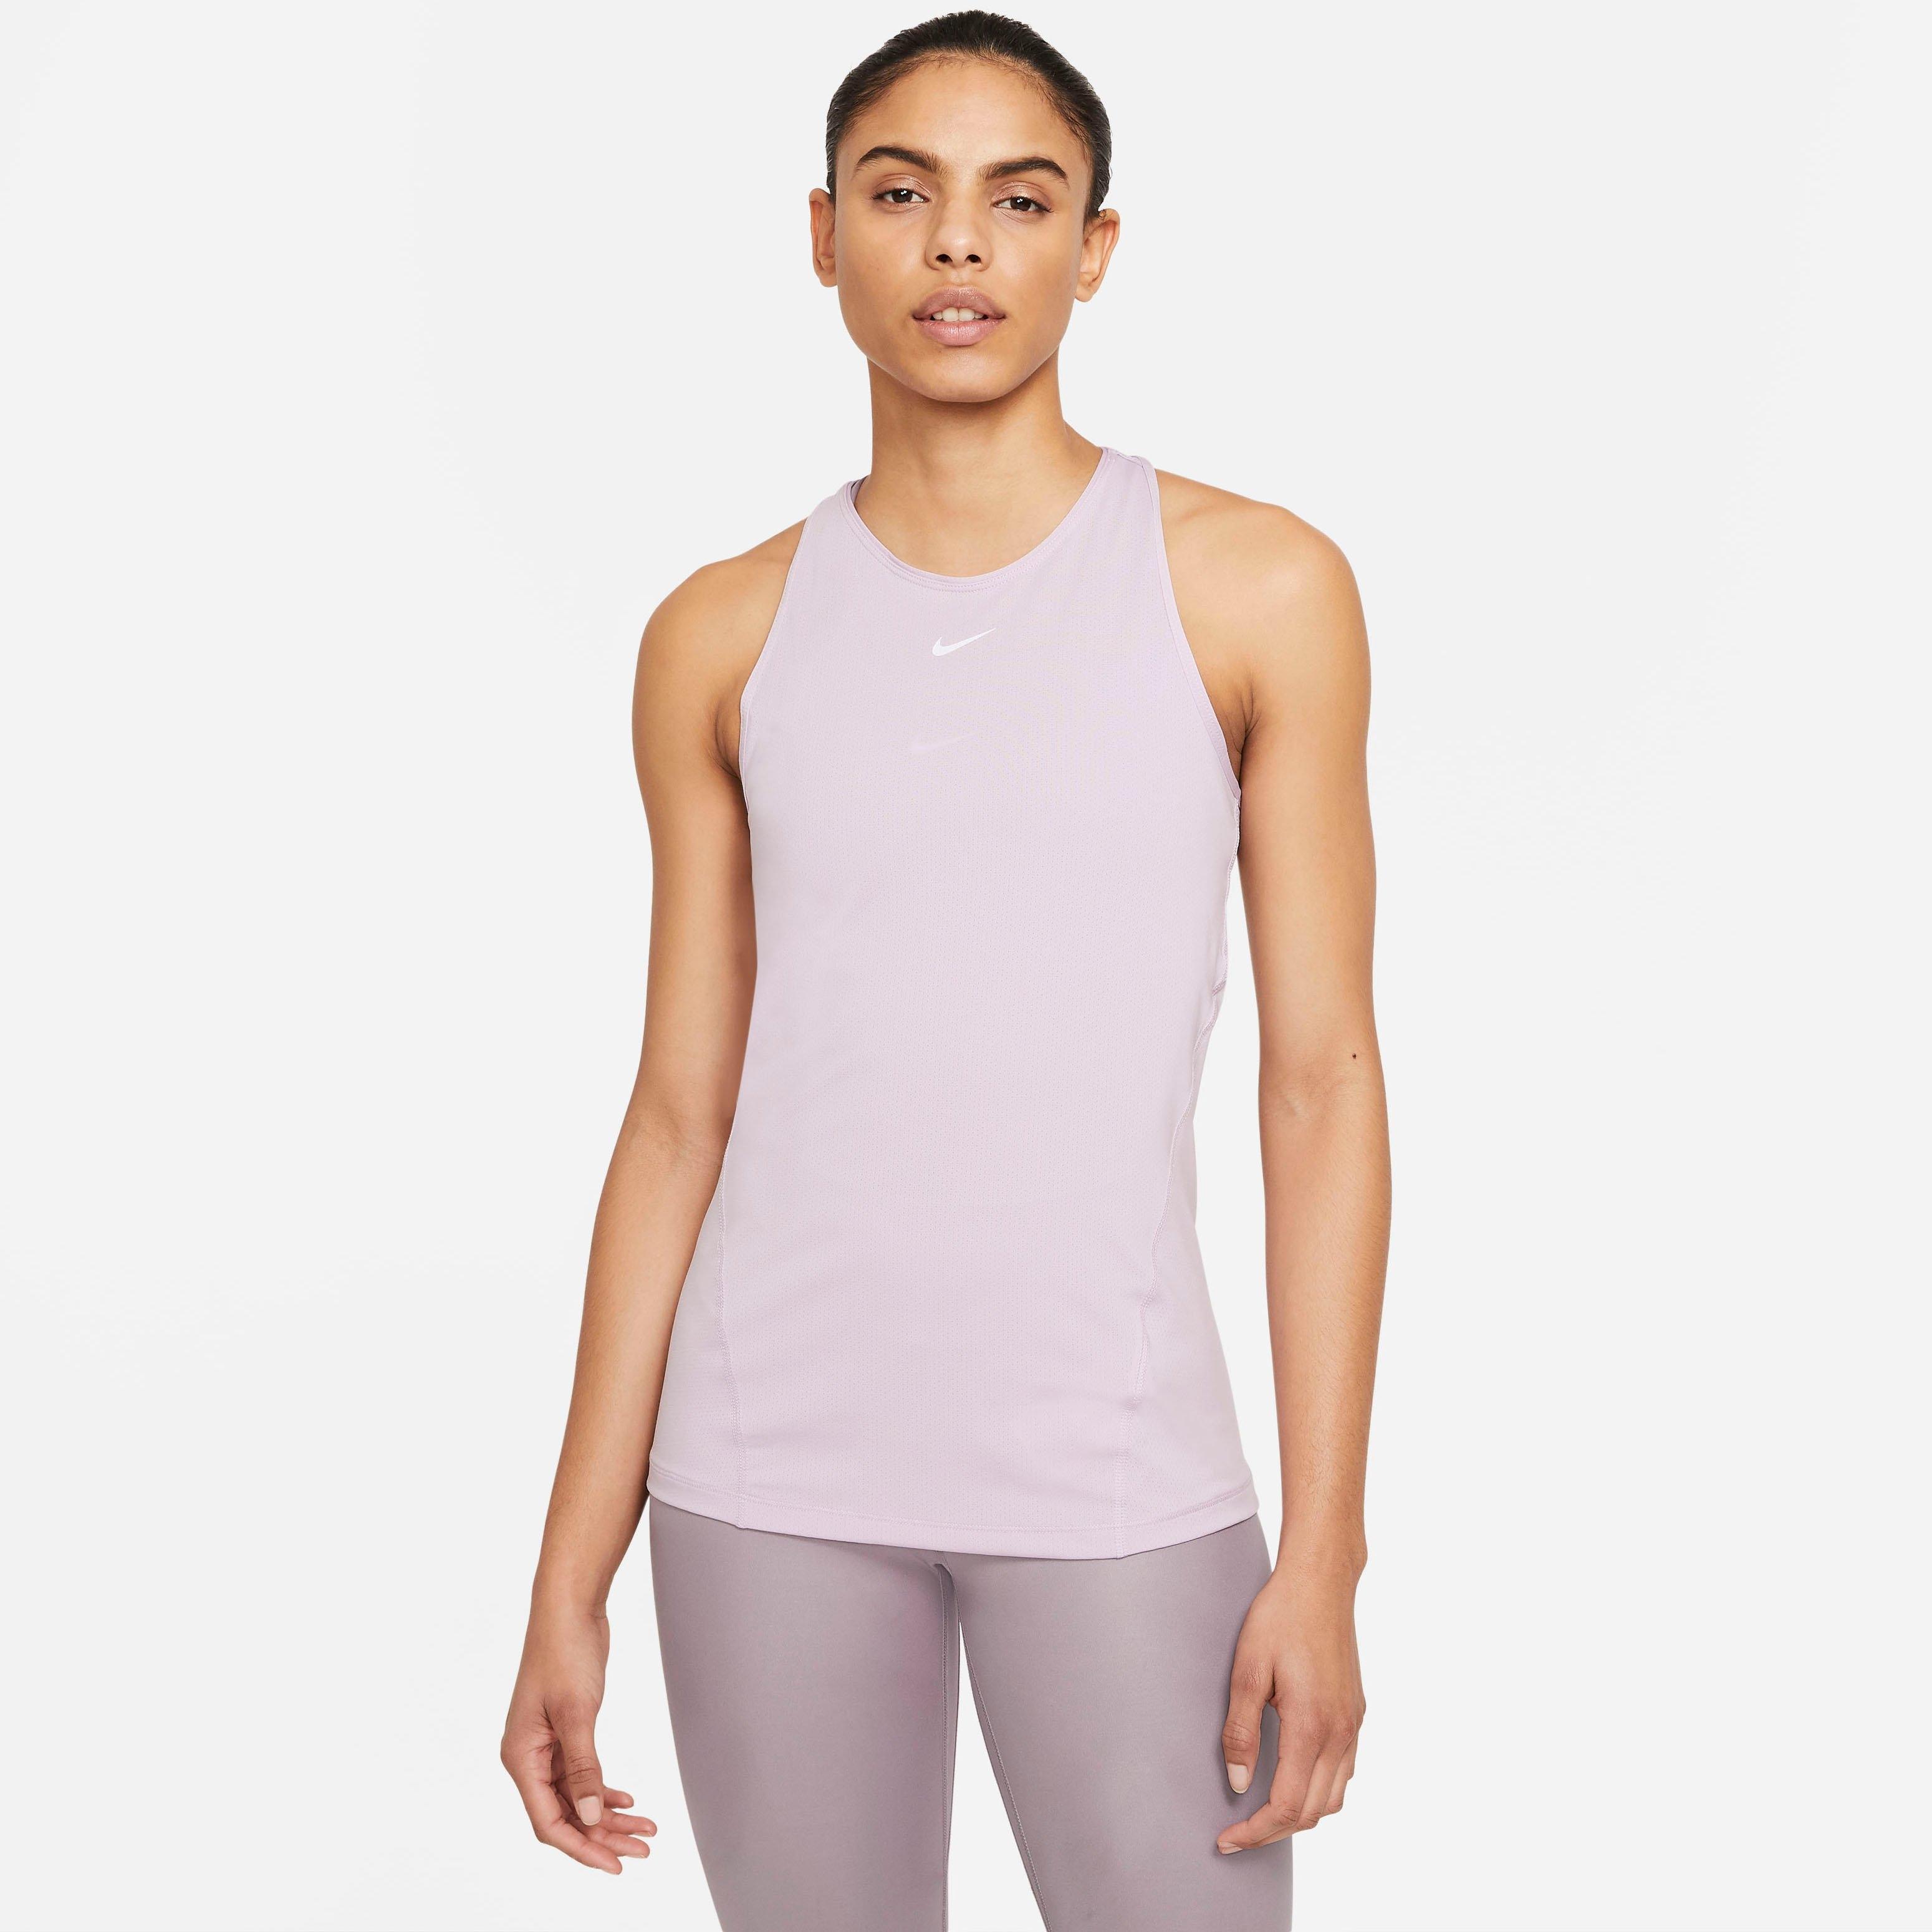 Nike functionele top WOMAN NP TANK ALL OVER MESH nu online bestellen